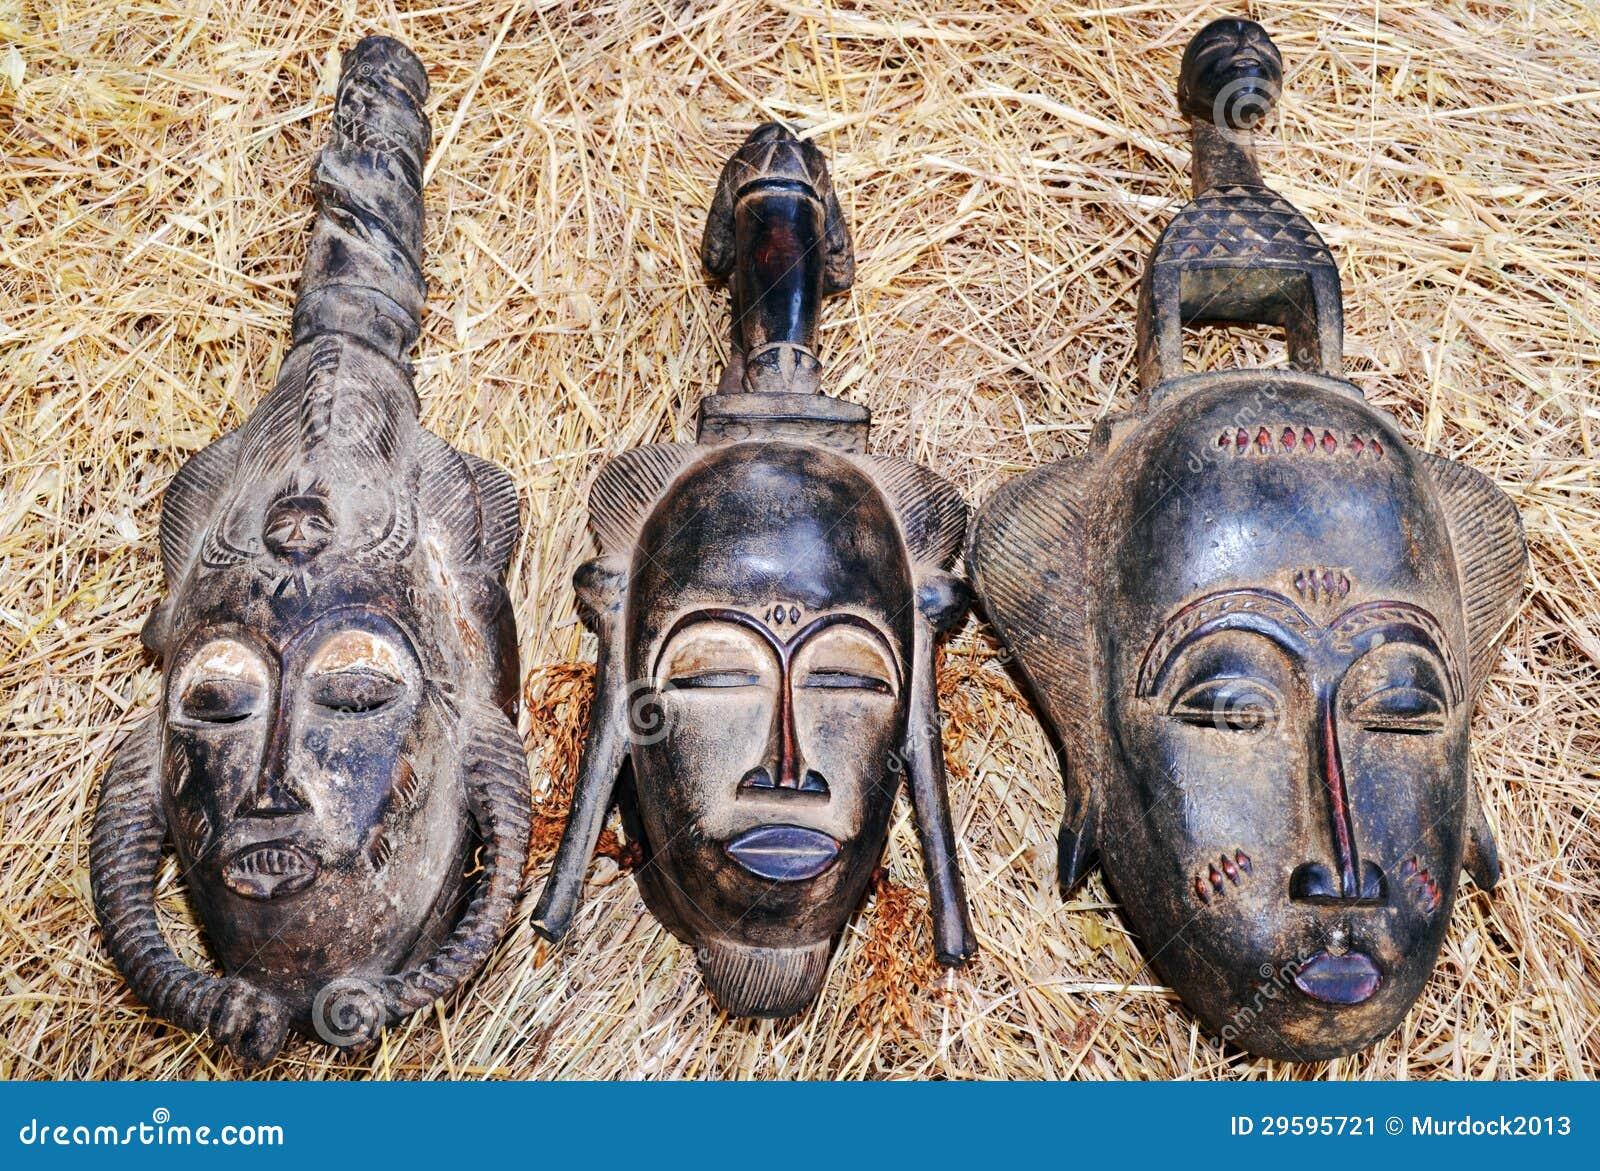 afrikanische masken stockbild bild 29595721. Black Bedroom Furniture Sets. Home Design Ideas